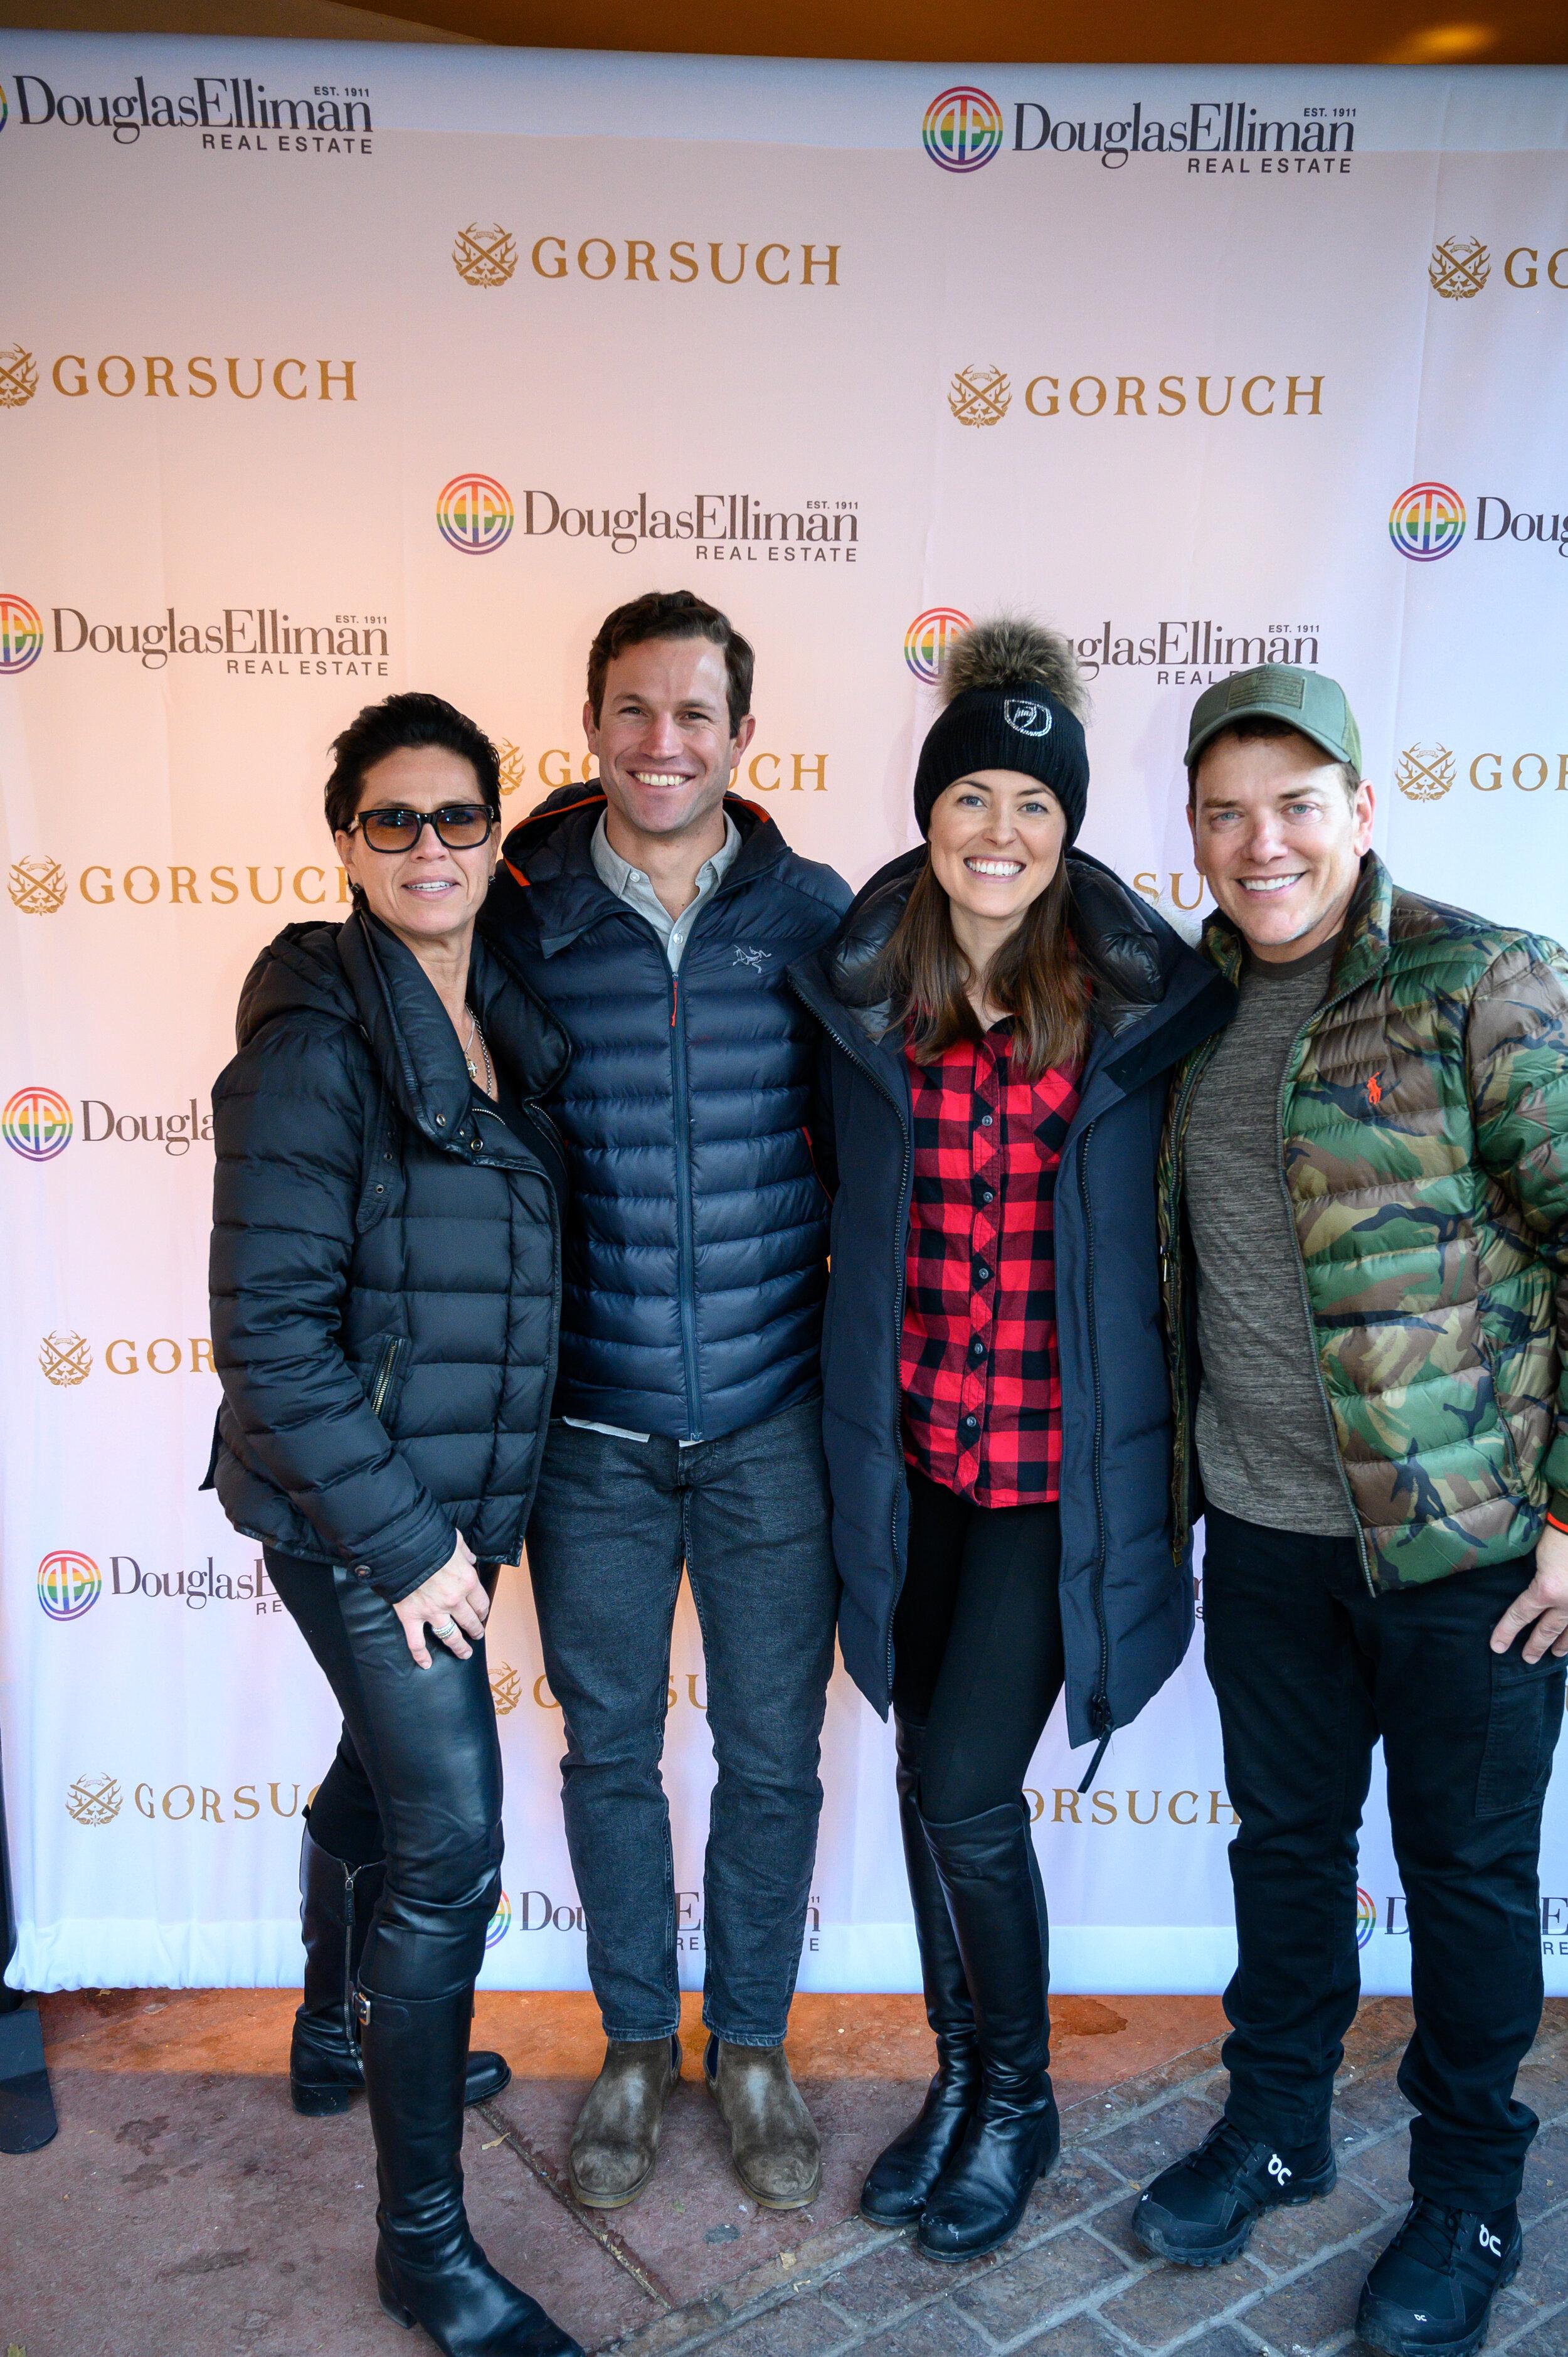 Hamptons Real Estate Showcase: Douglas Elliman Sponsors 43rd Annual Aspen Gay Ski Week 2020